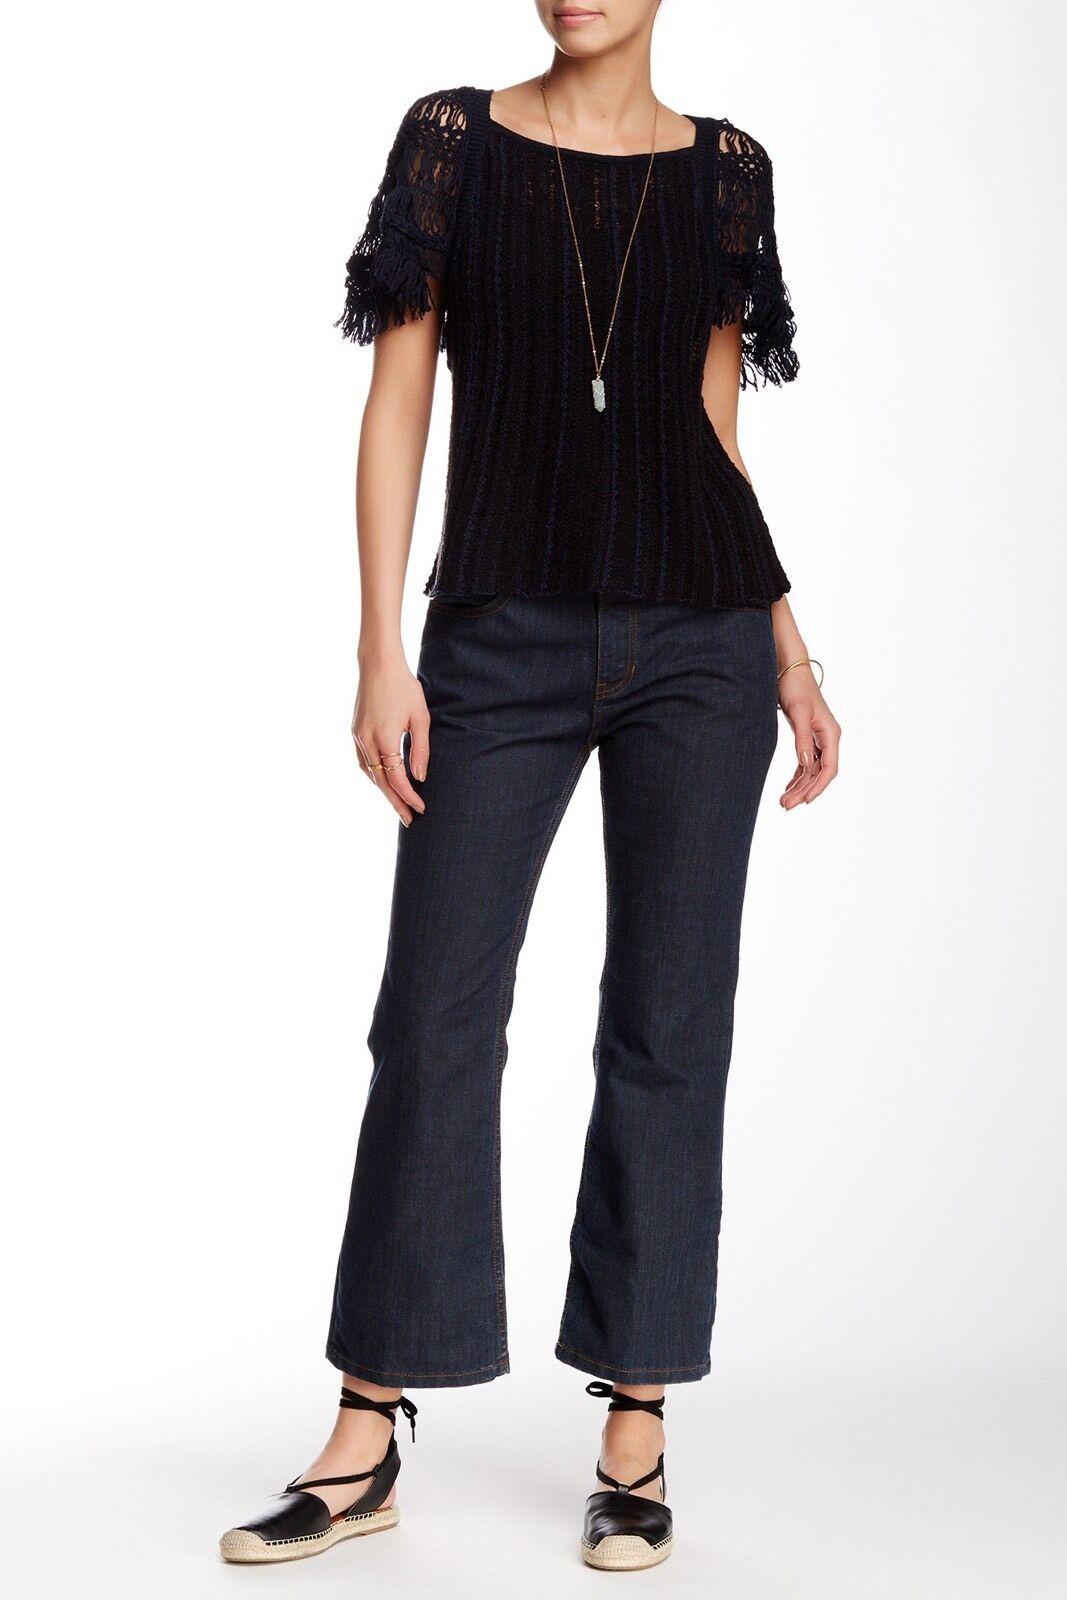 Free People Women's High Rise Denim Flare Jean - Size W 29 - Retail